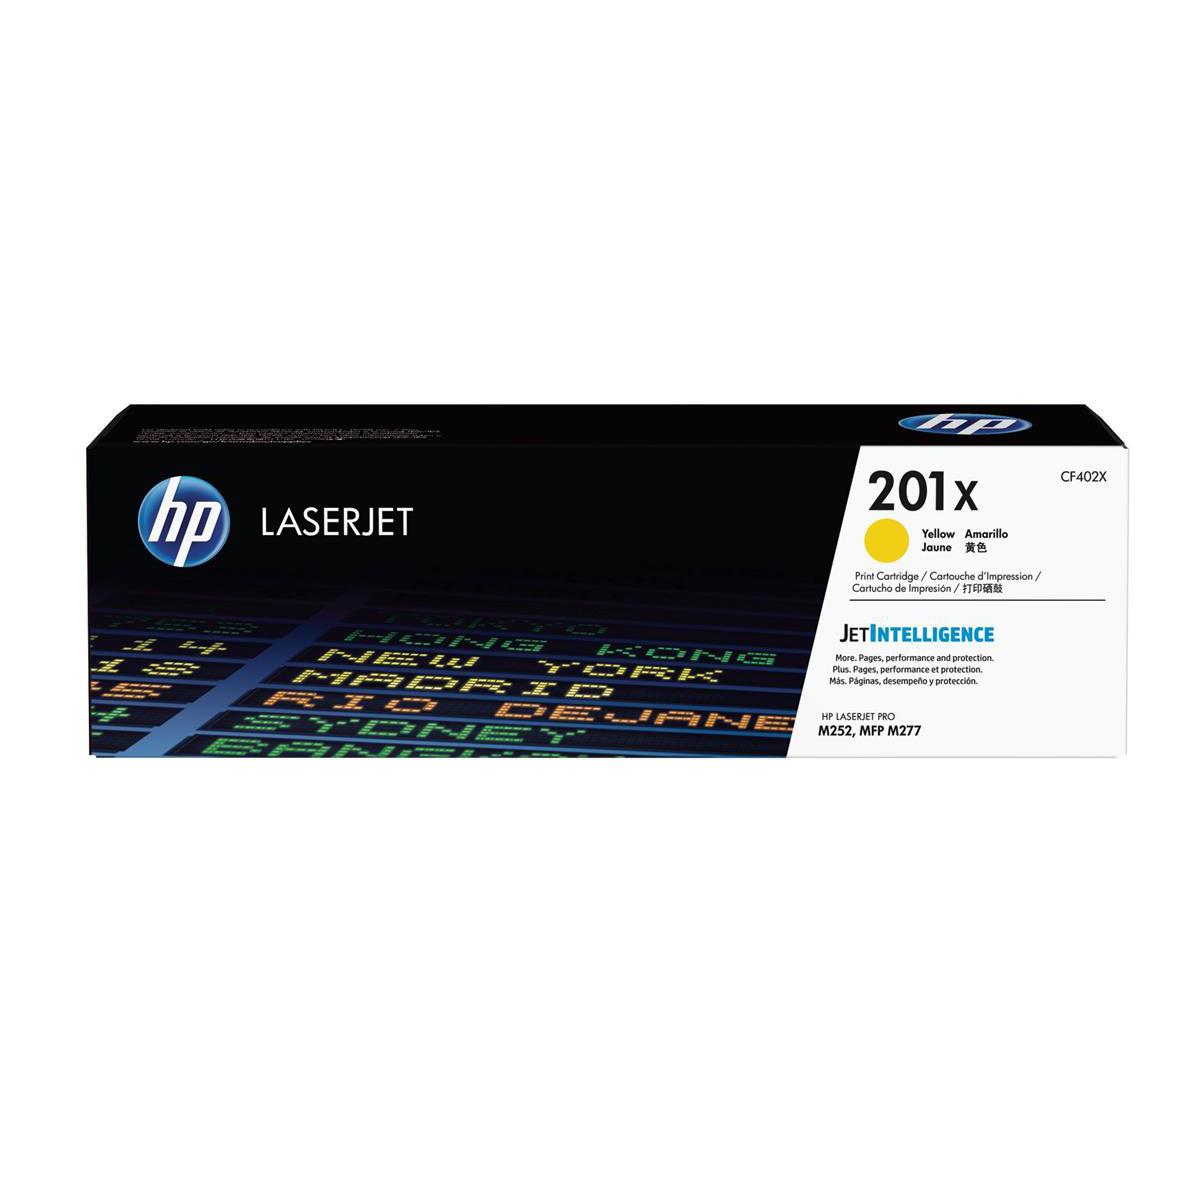 Hewlett Packard [HP] 201X Laserjet Toner Cartridge Yellow High Yield Ref CF402X